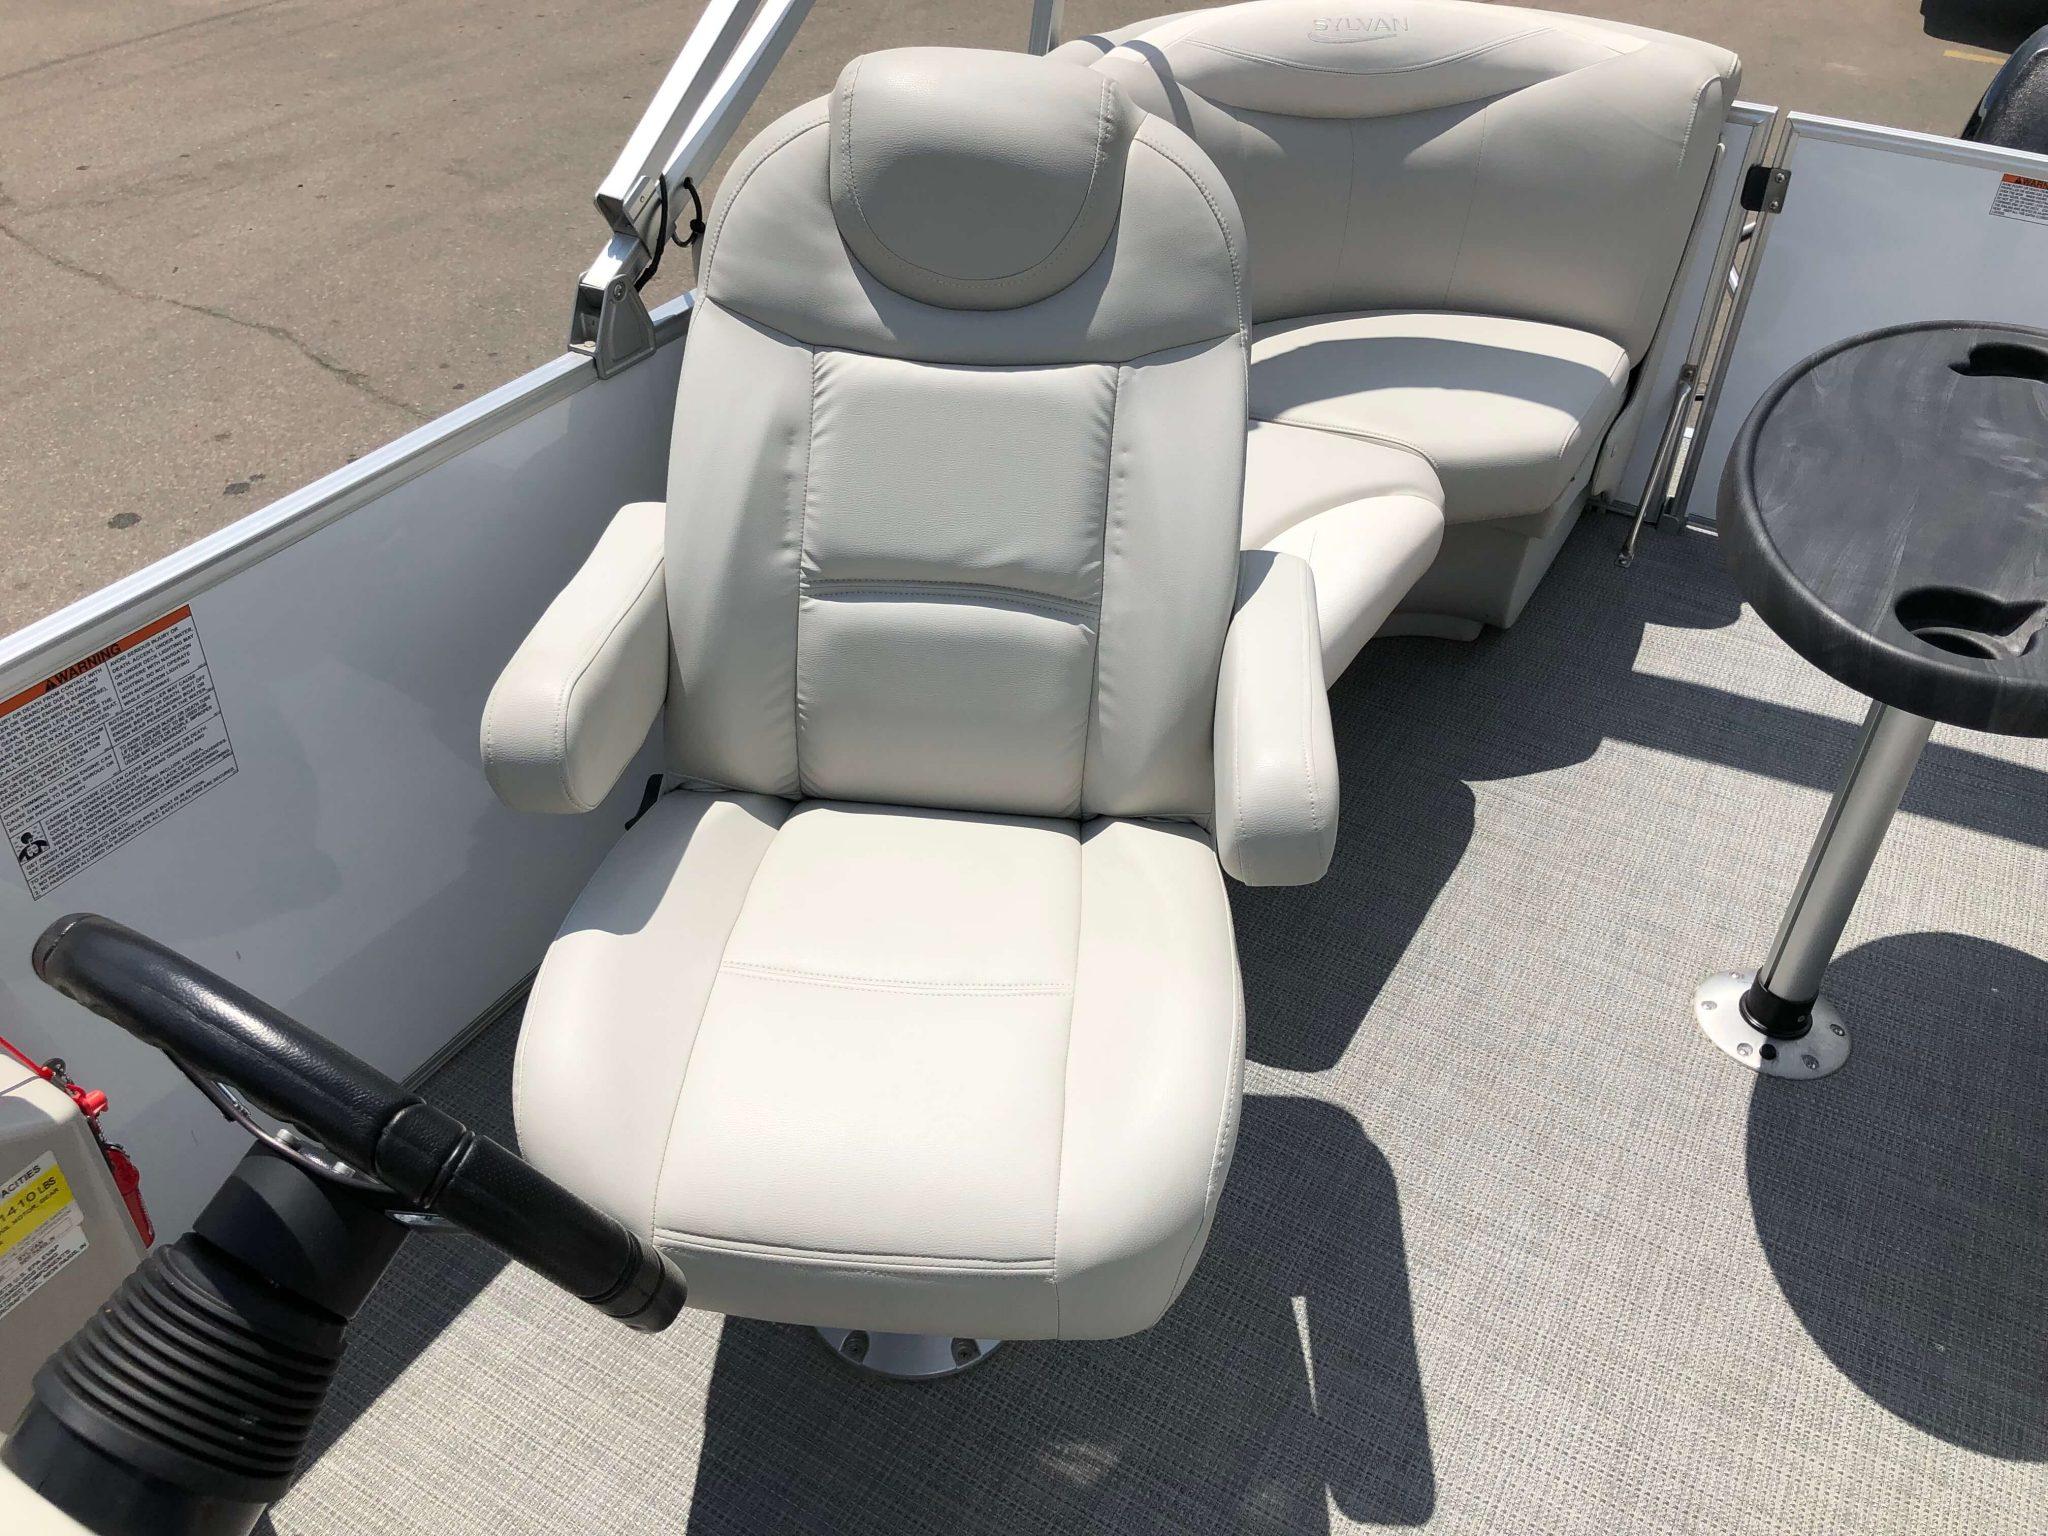 2016 Sylvan 8520 LZ LES Pontoon Boat Helm Chair